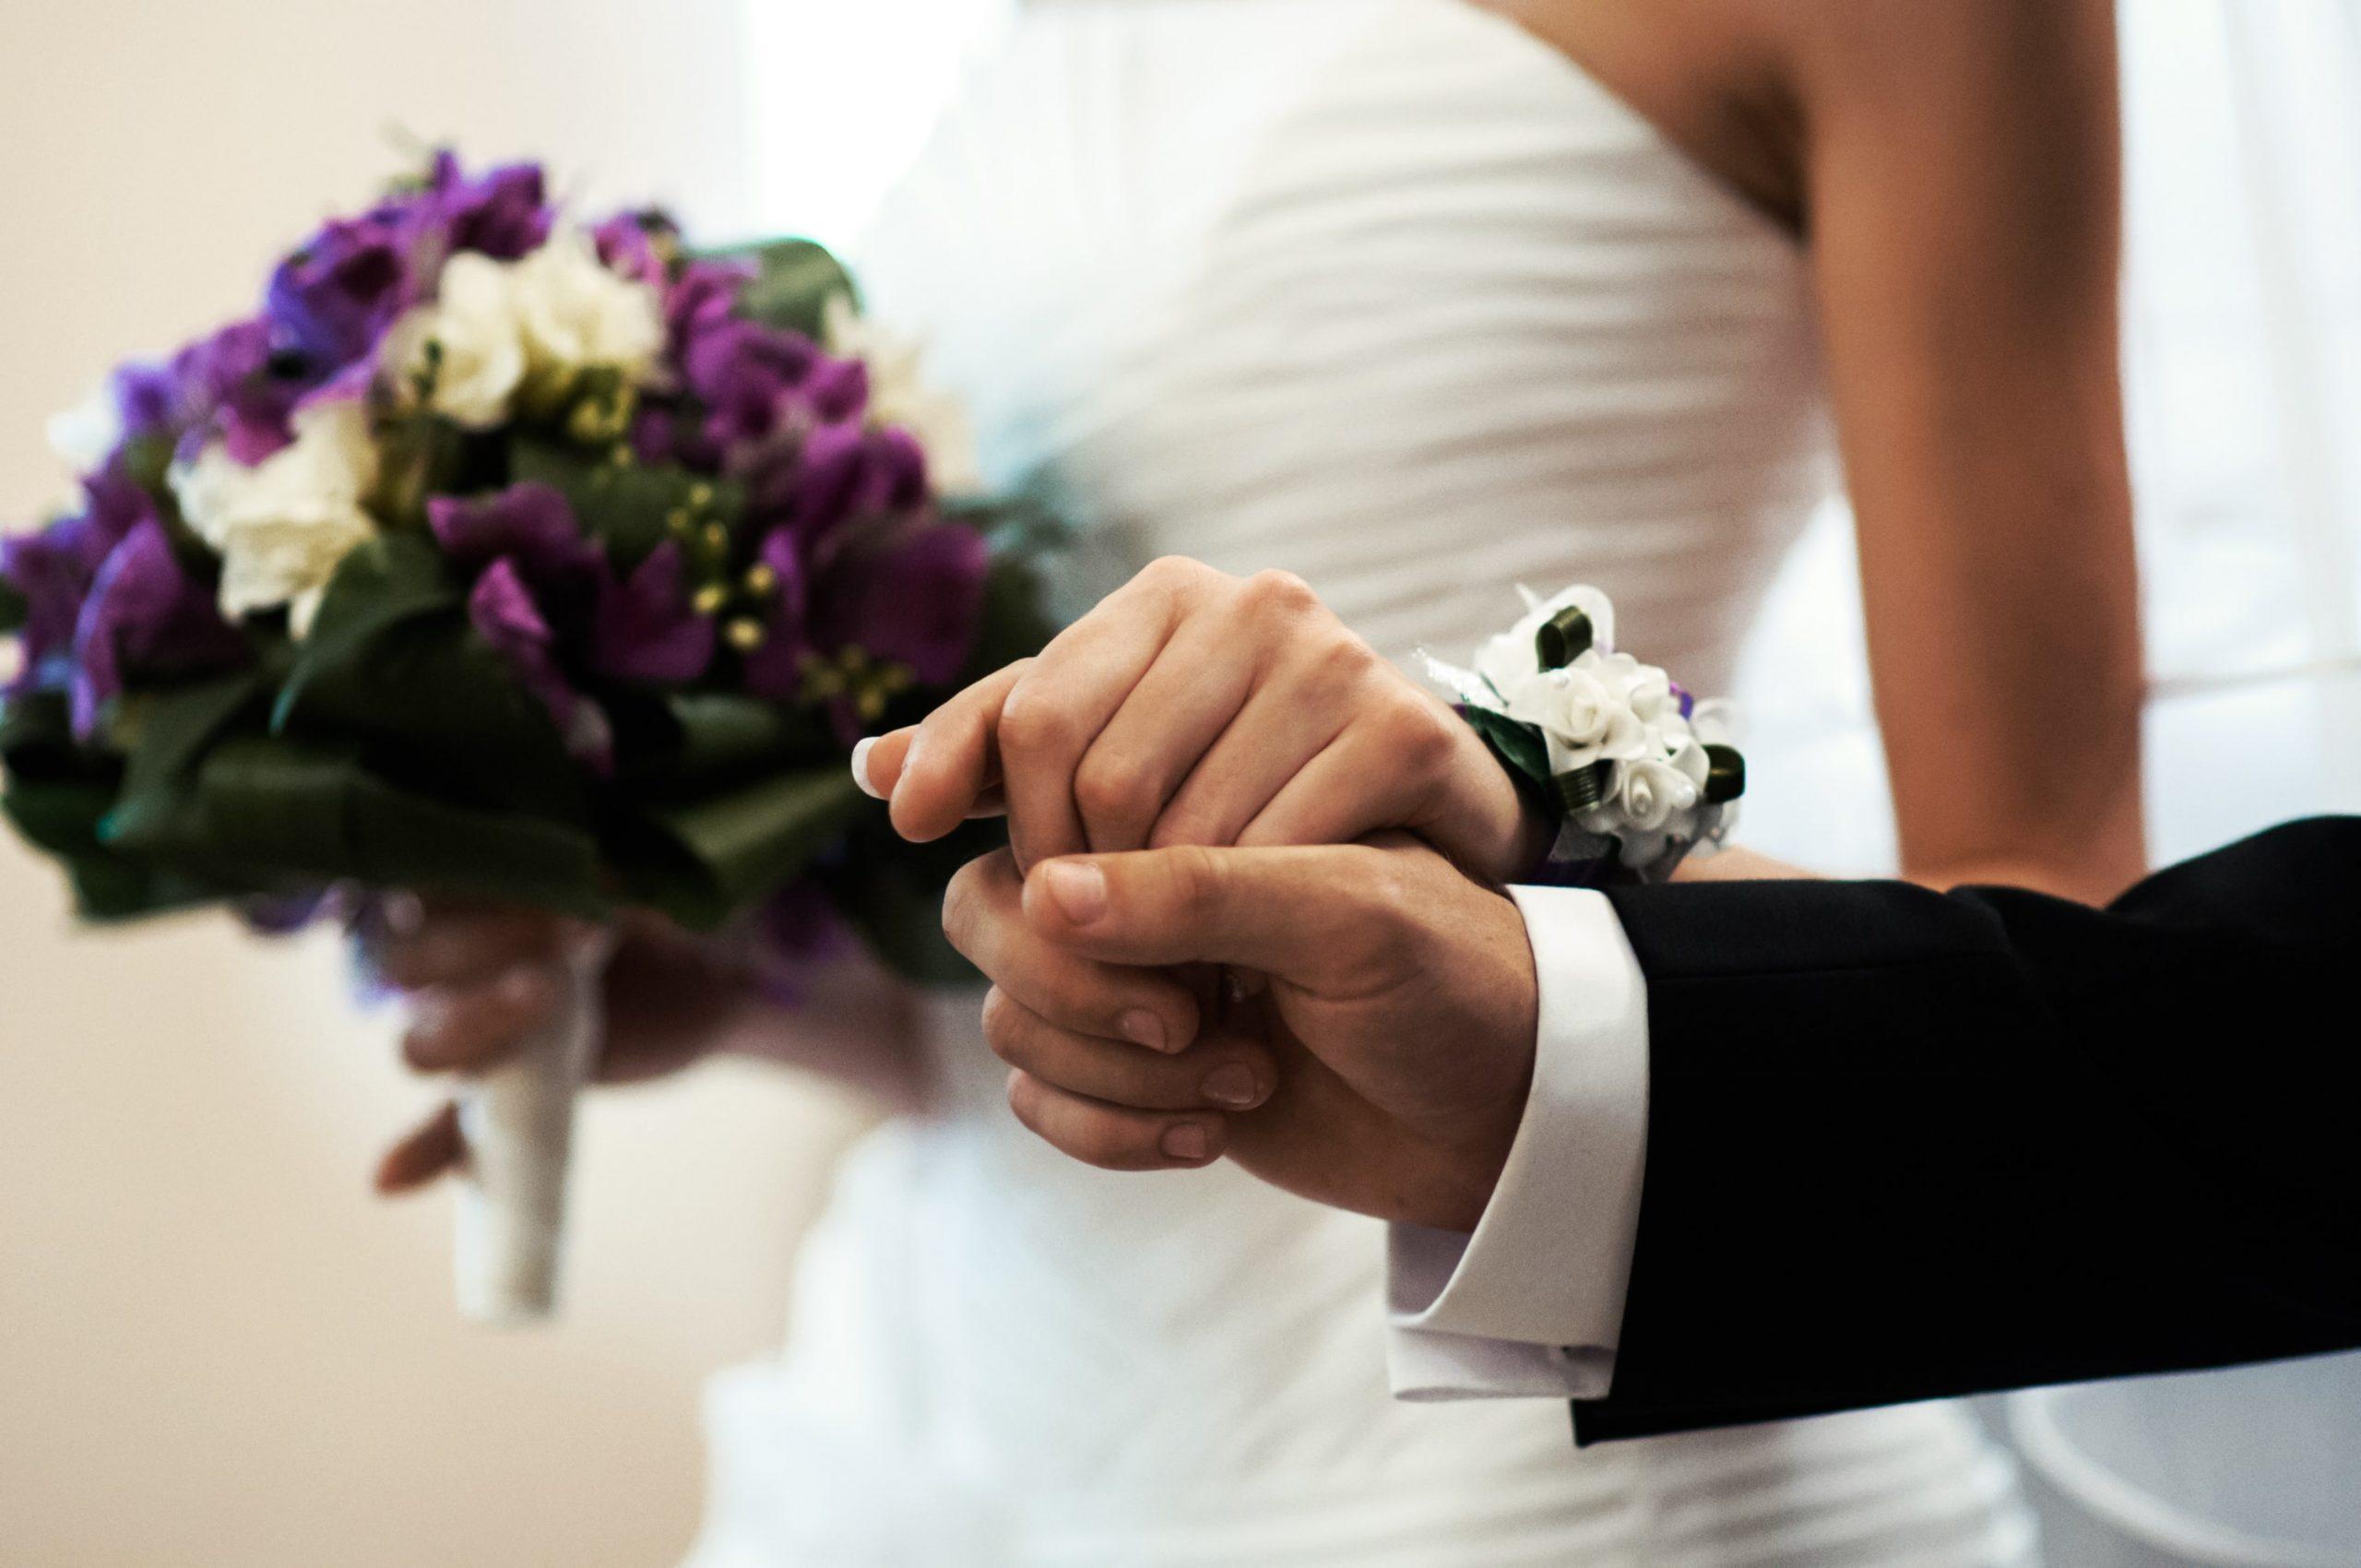 wedding-engagement-time-D5DLTVU